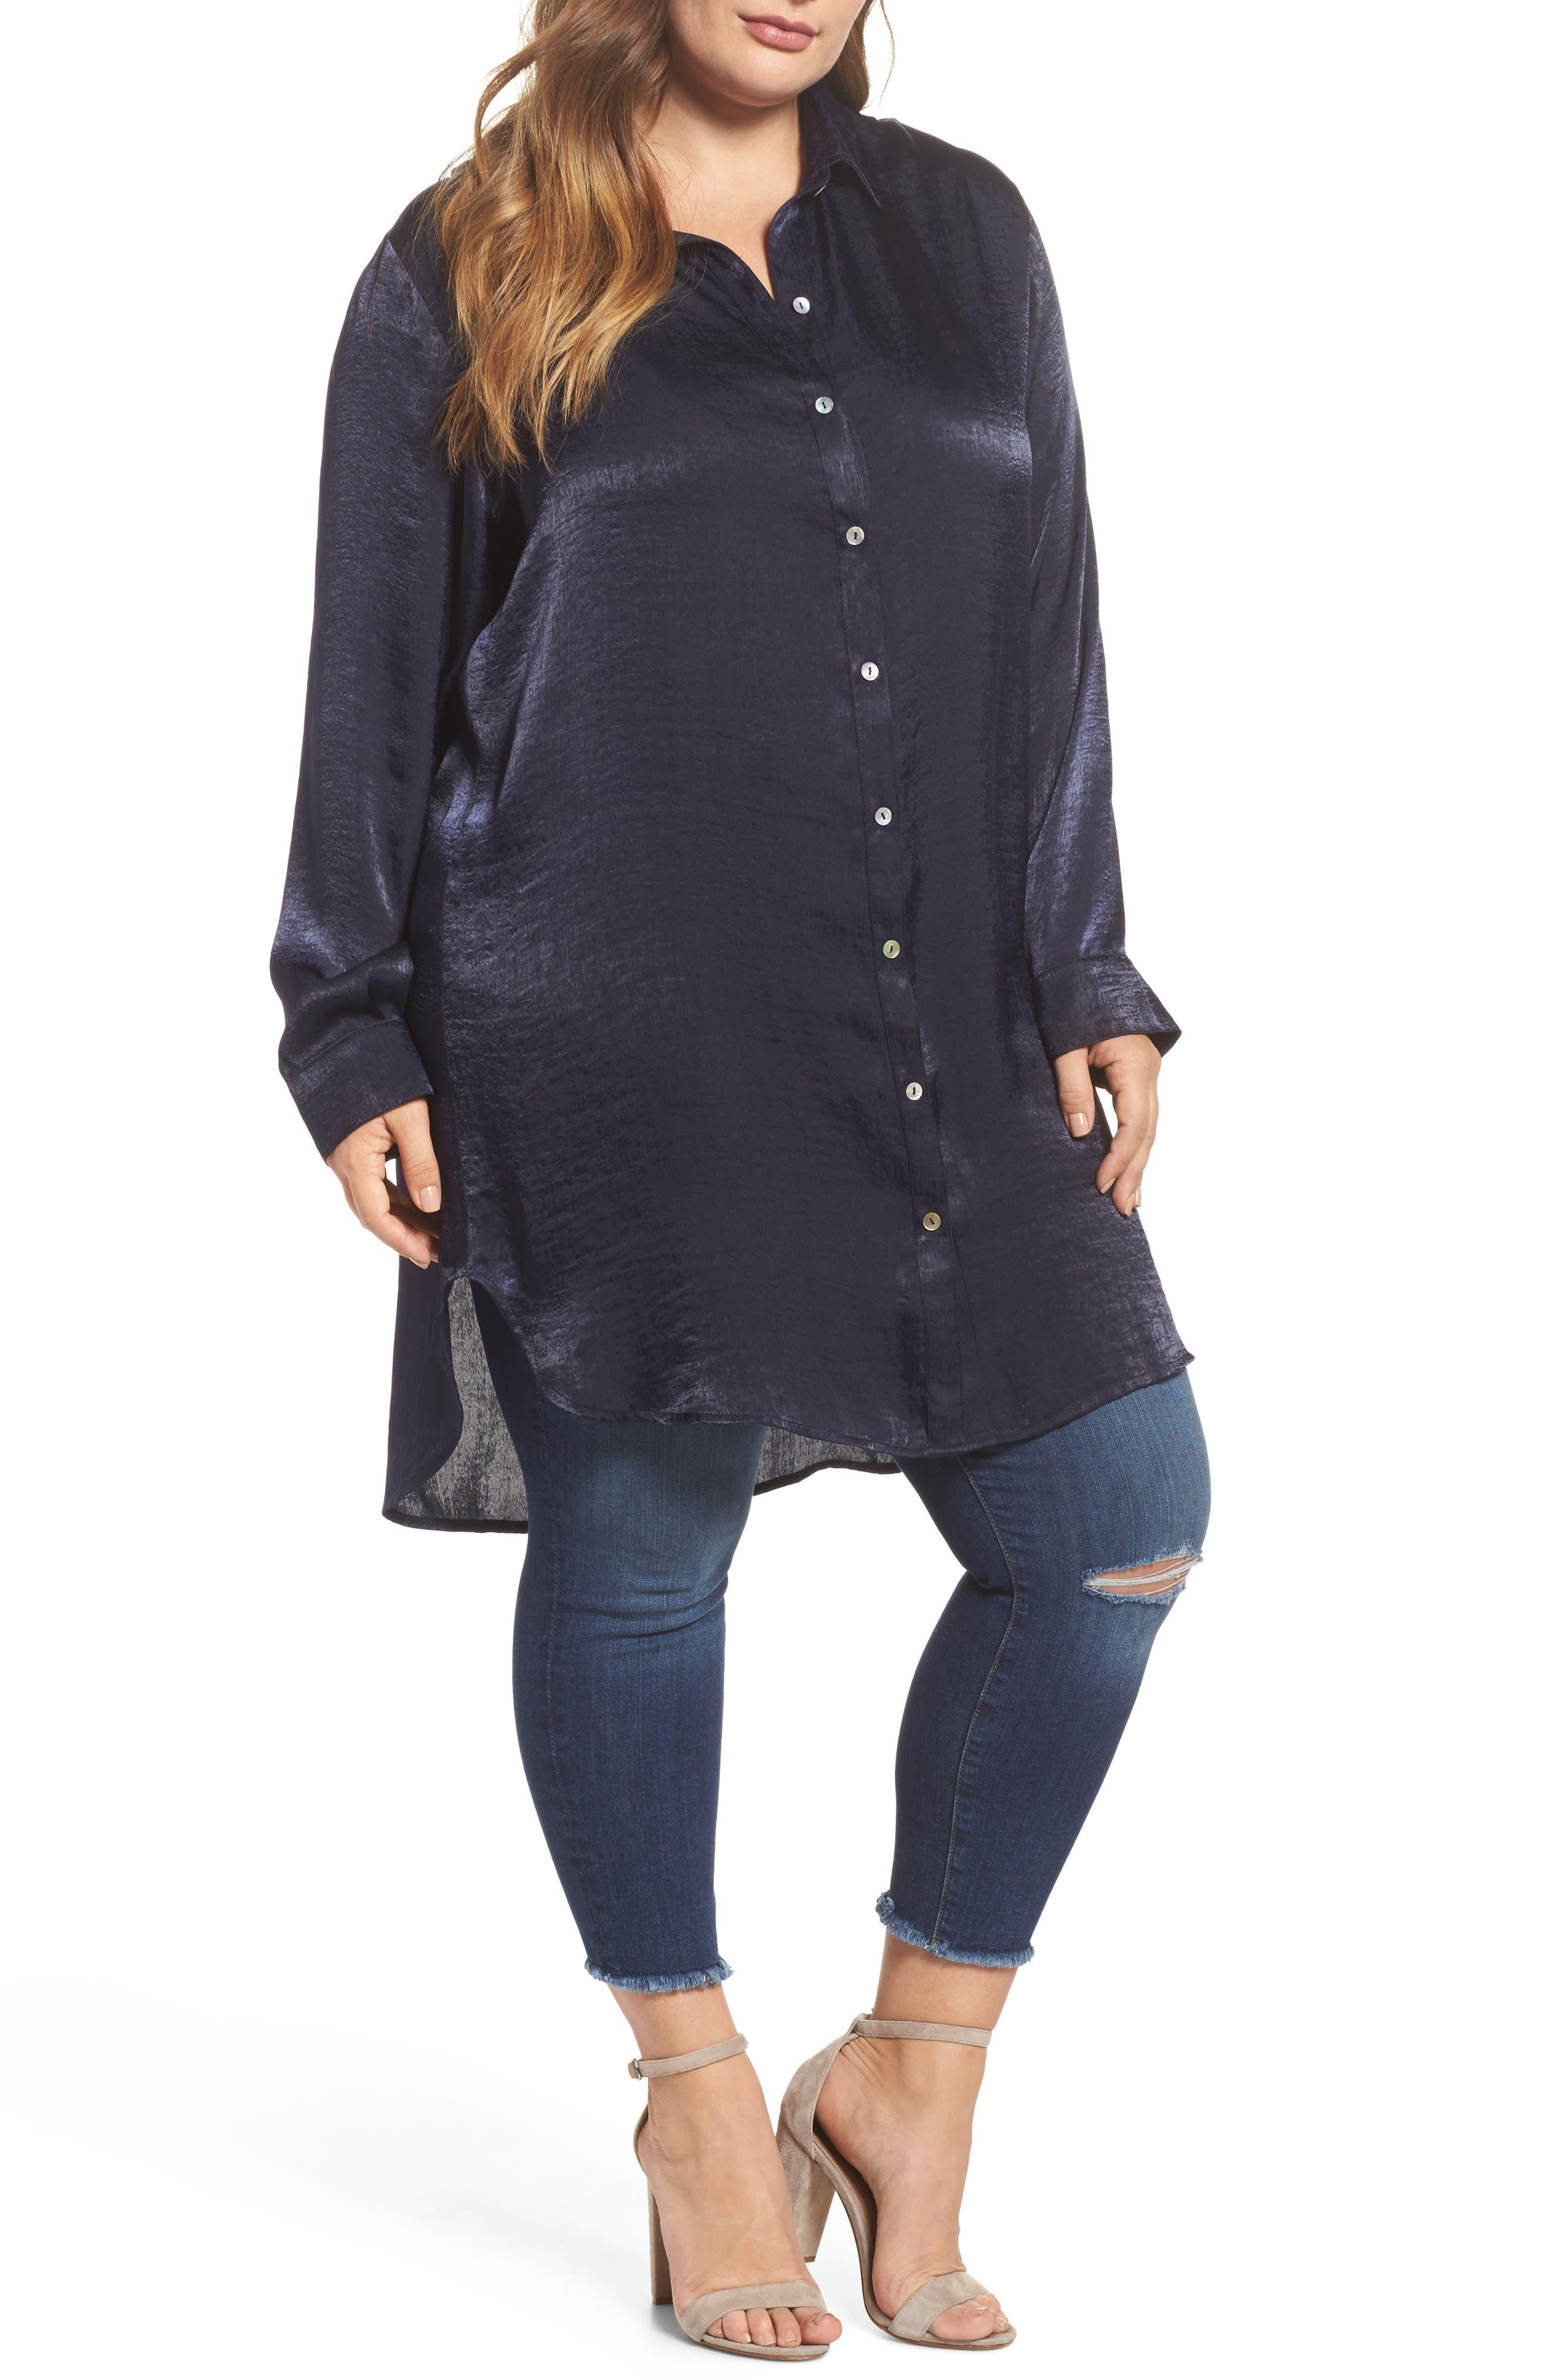 Main Image - SLINK Jeans Hammered Satin Tunic Shirt (Plus Size)